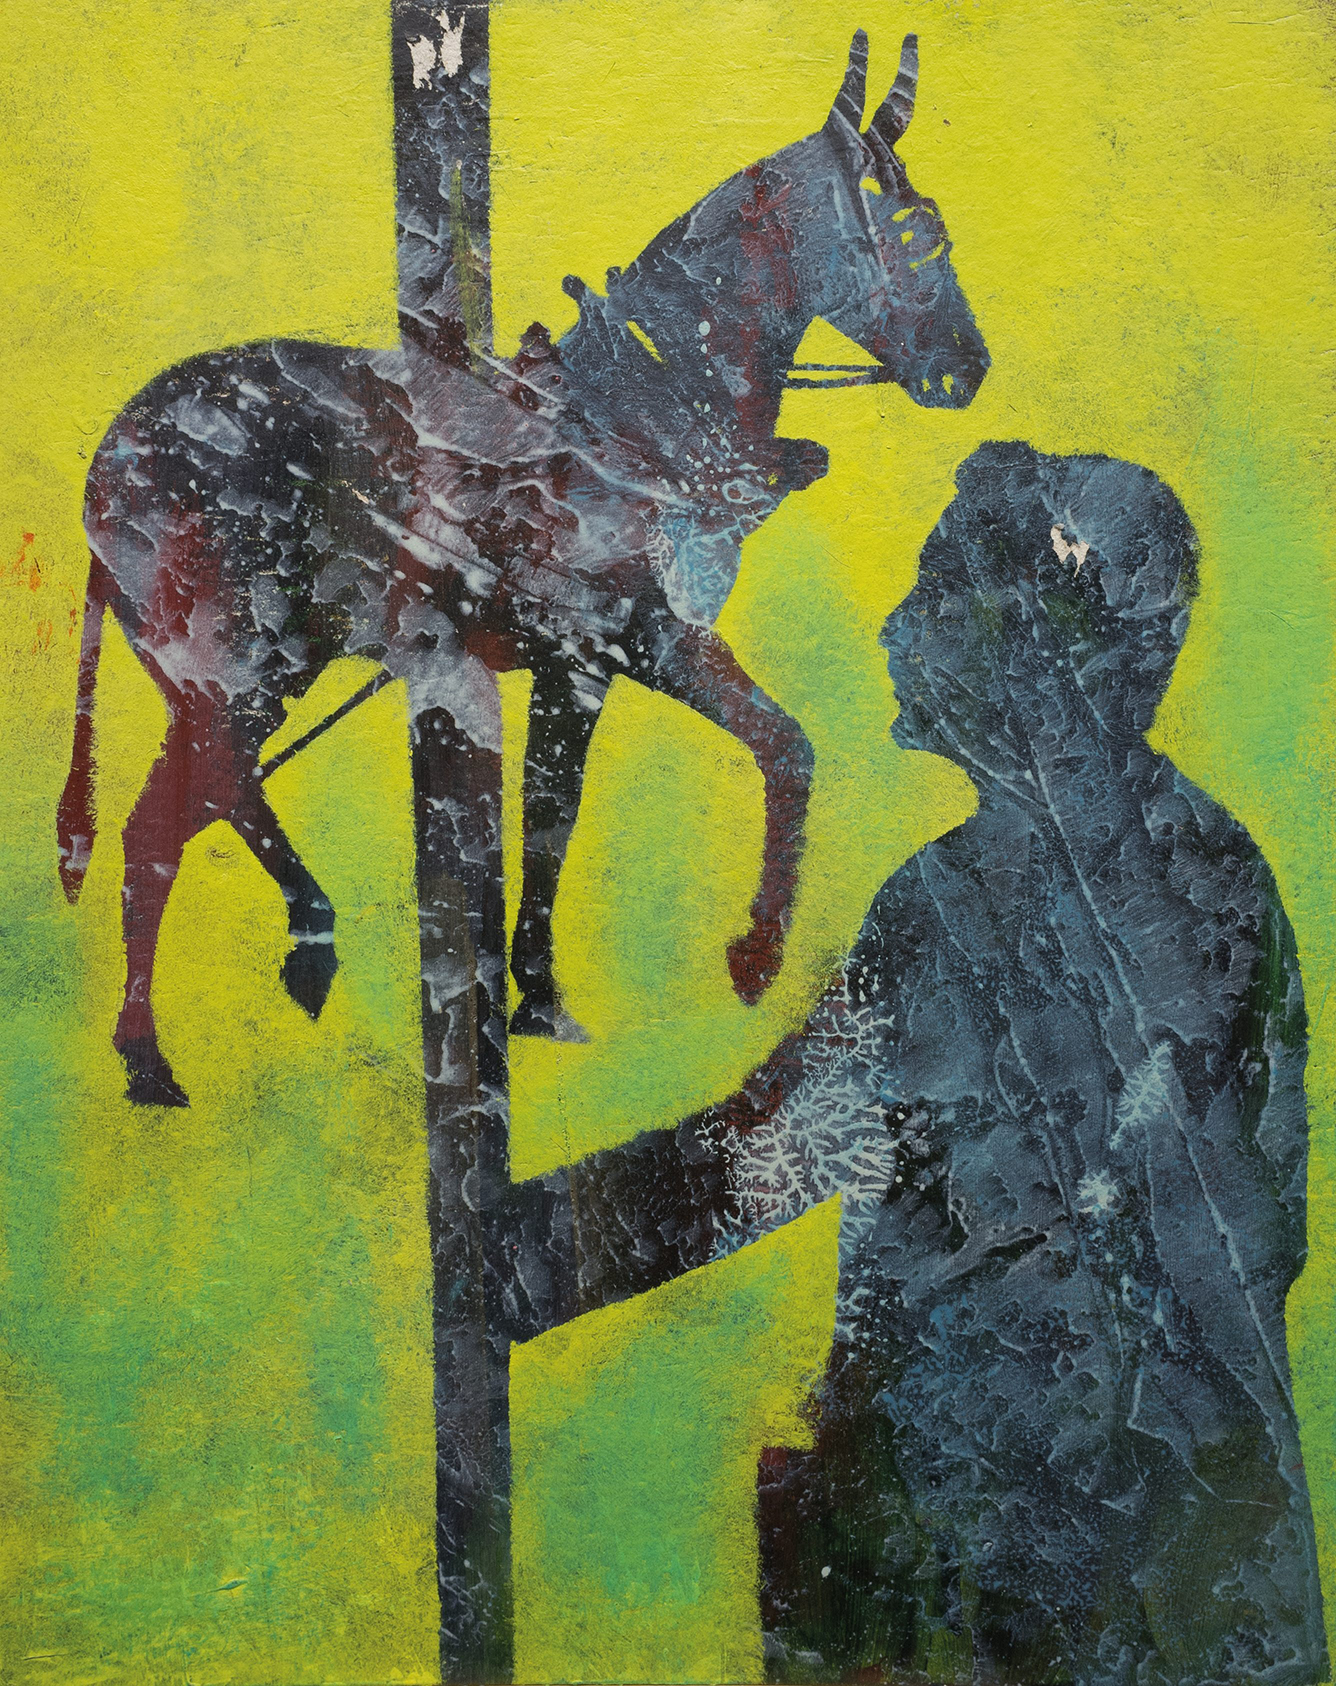 Der Unterhändler, 201. Acrylic on cardboard, 32 x 40 cm